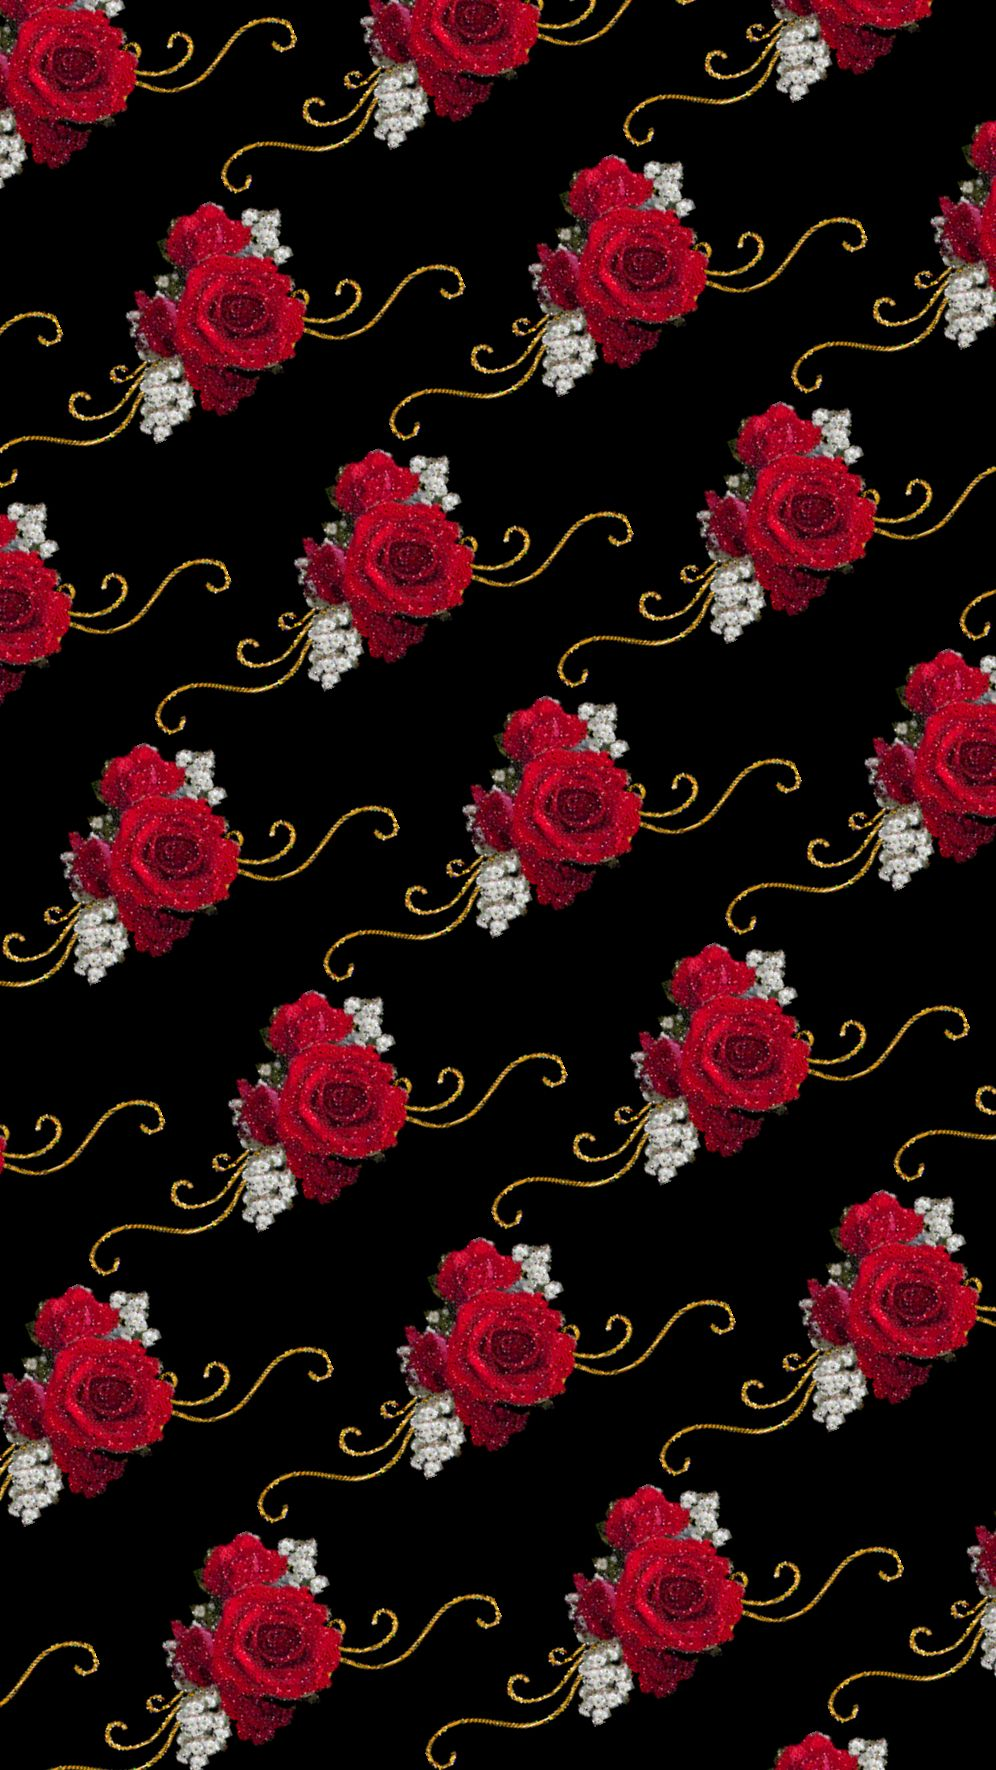 Wallpaper By Artist Unknown Flower Wallpaper Iphone Background Wallpaper Rose Wallpaper